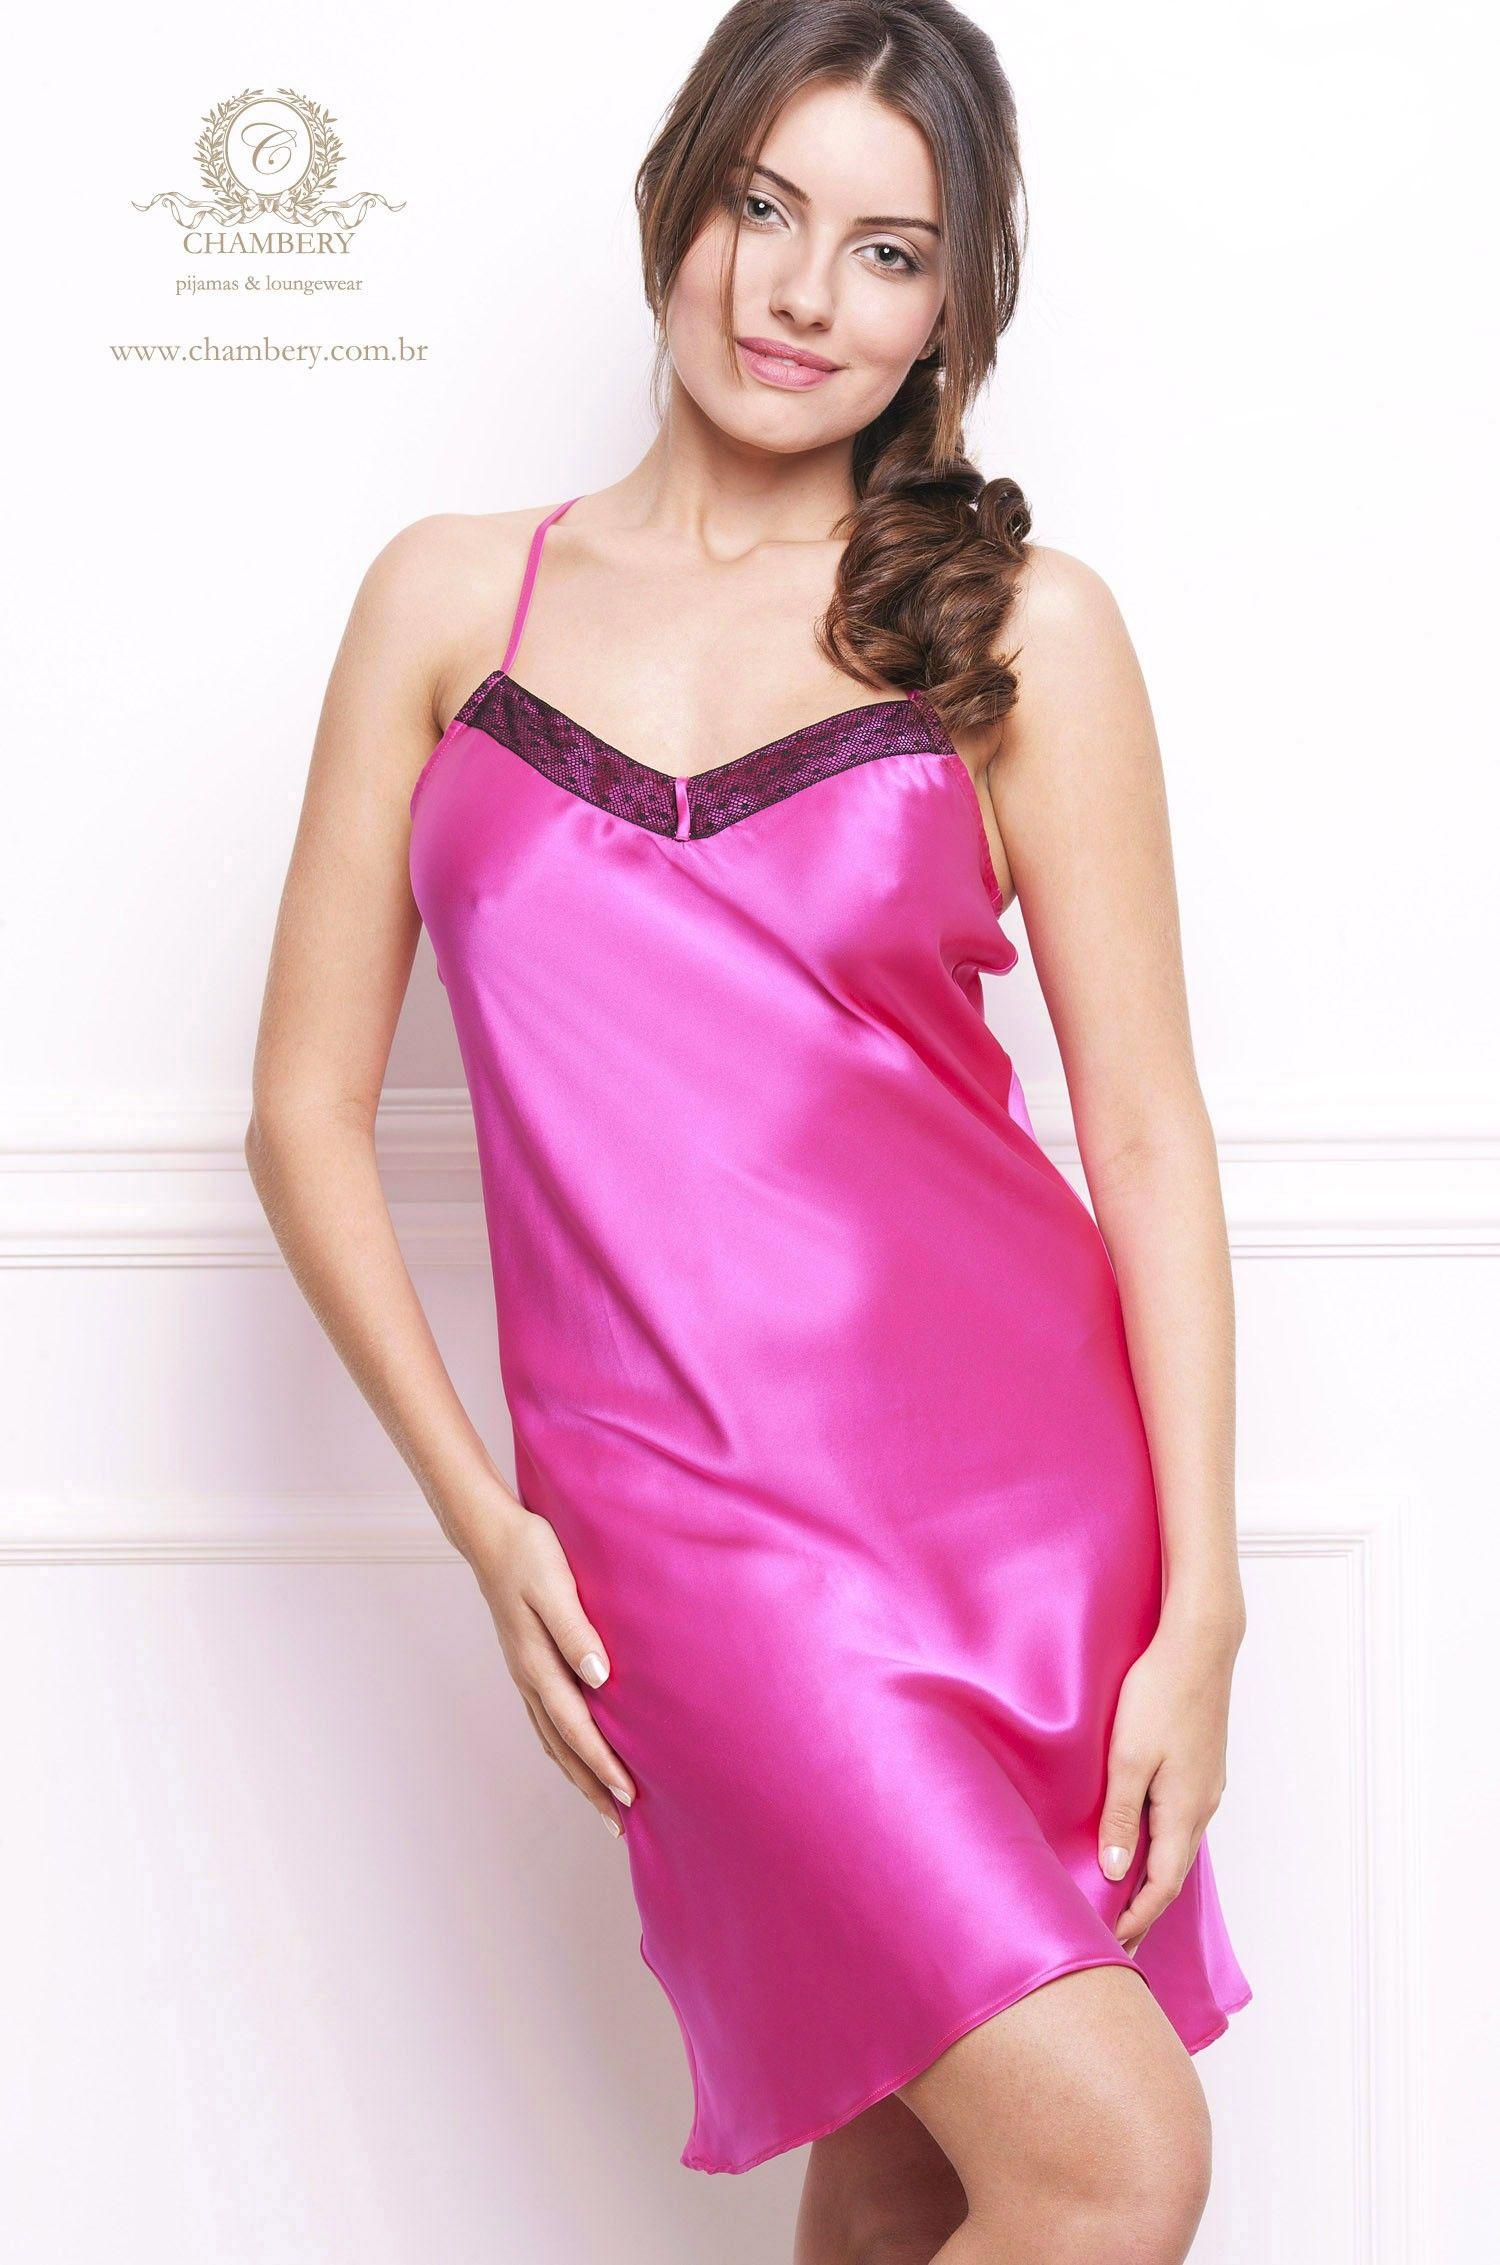 18f53f5fd Camisola Livia Seda Pura Chambery - Pijamas   Loungewear